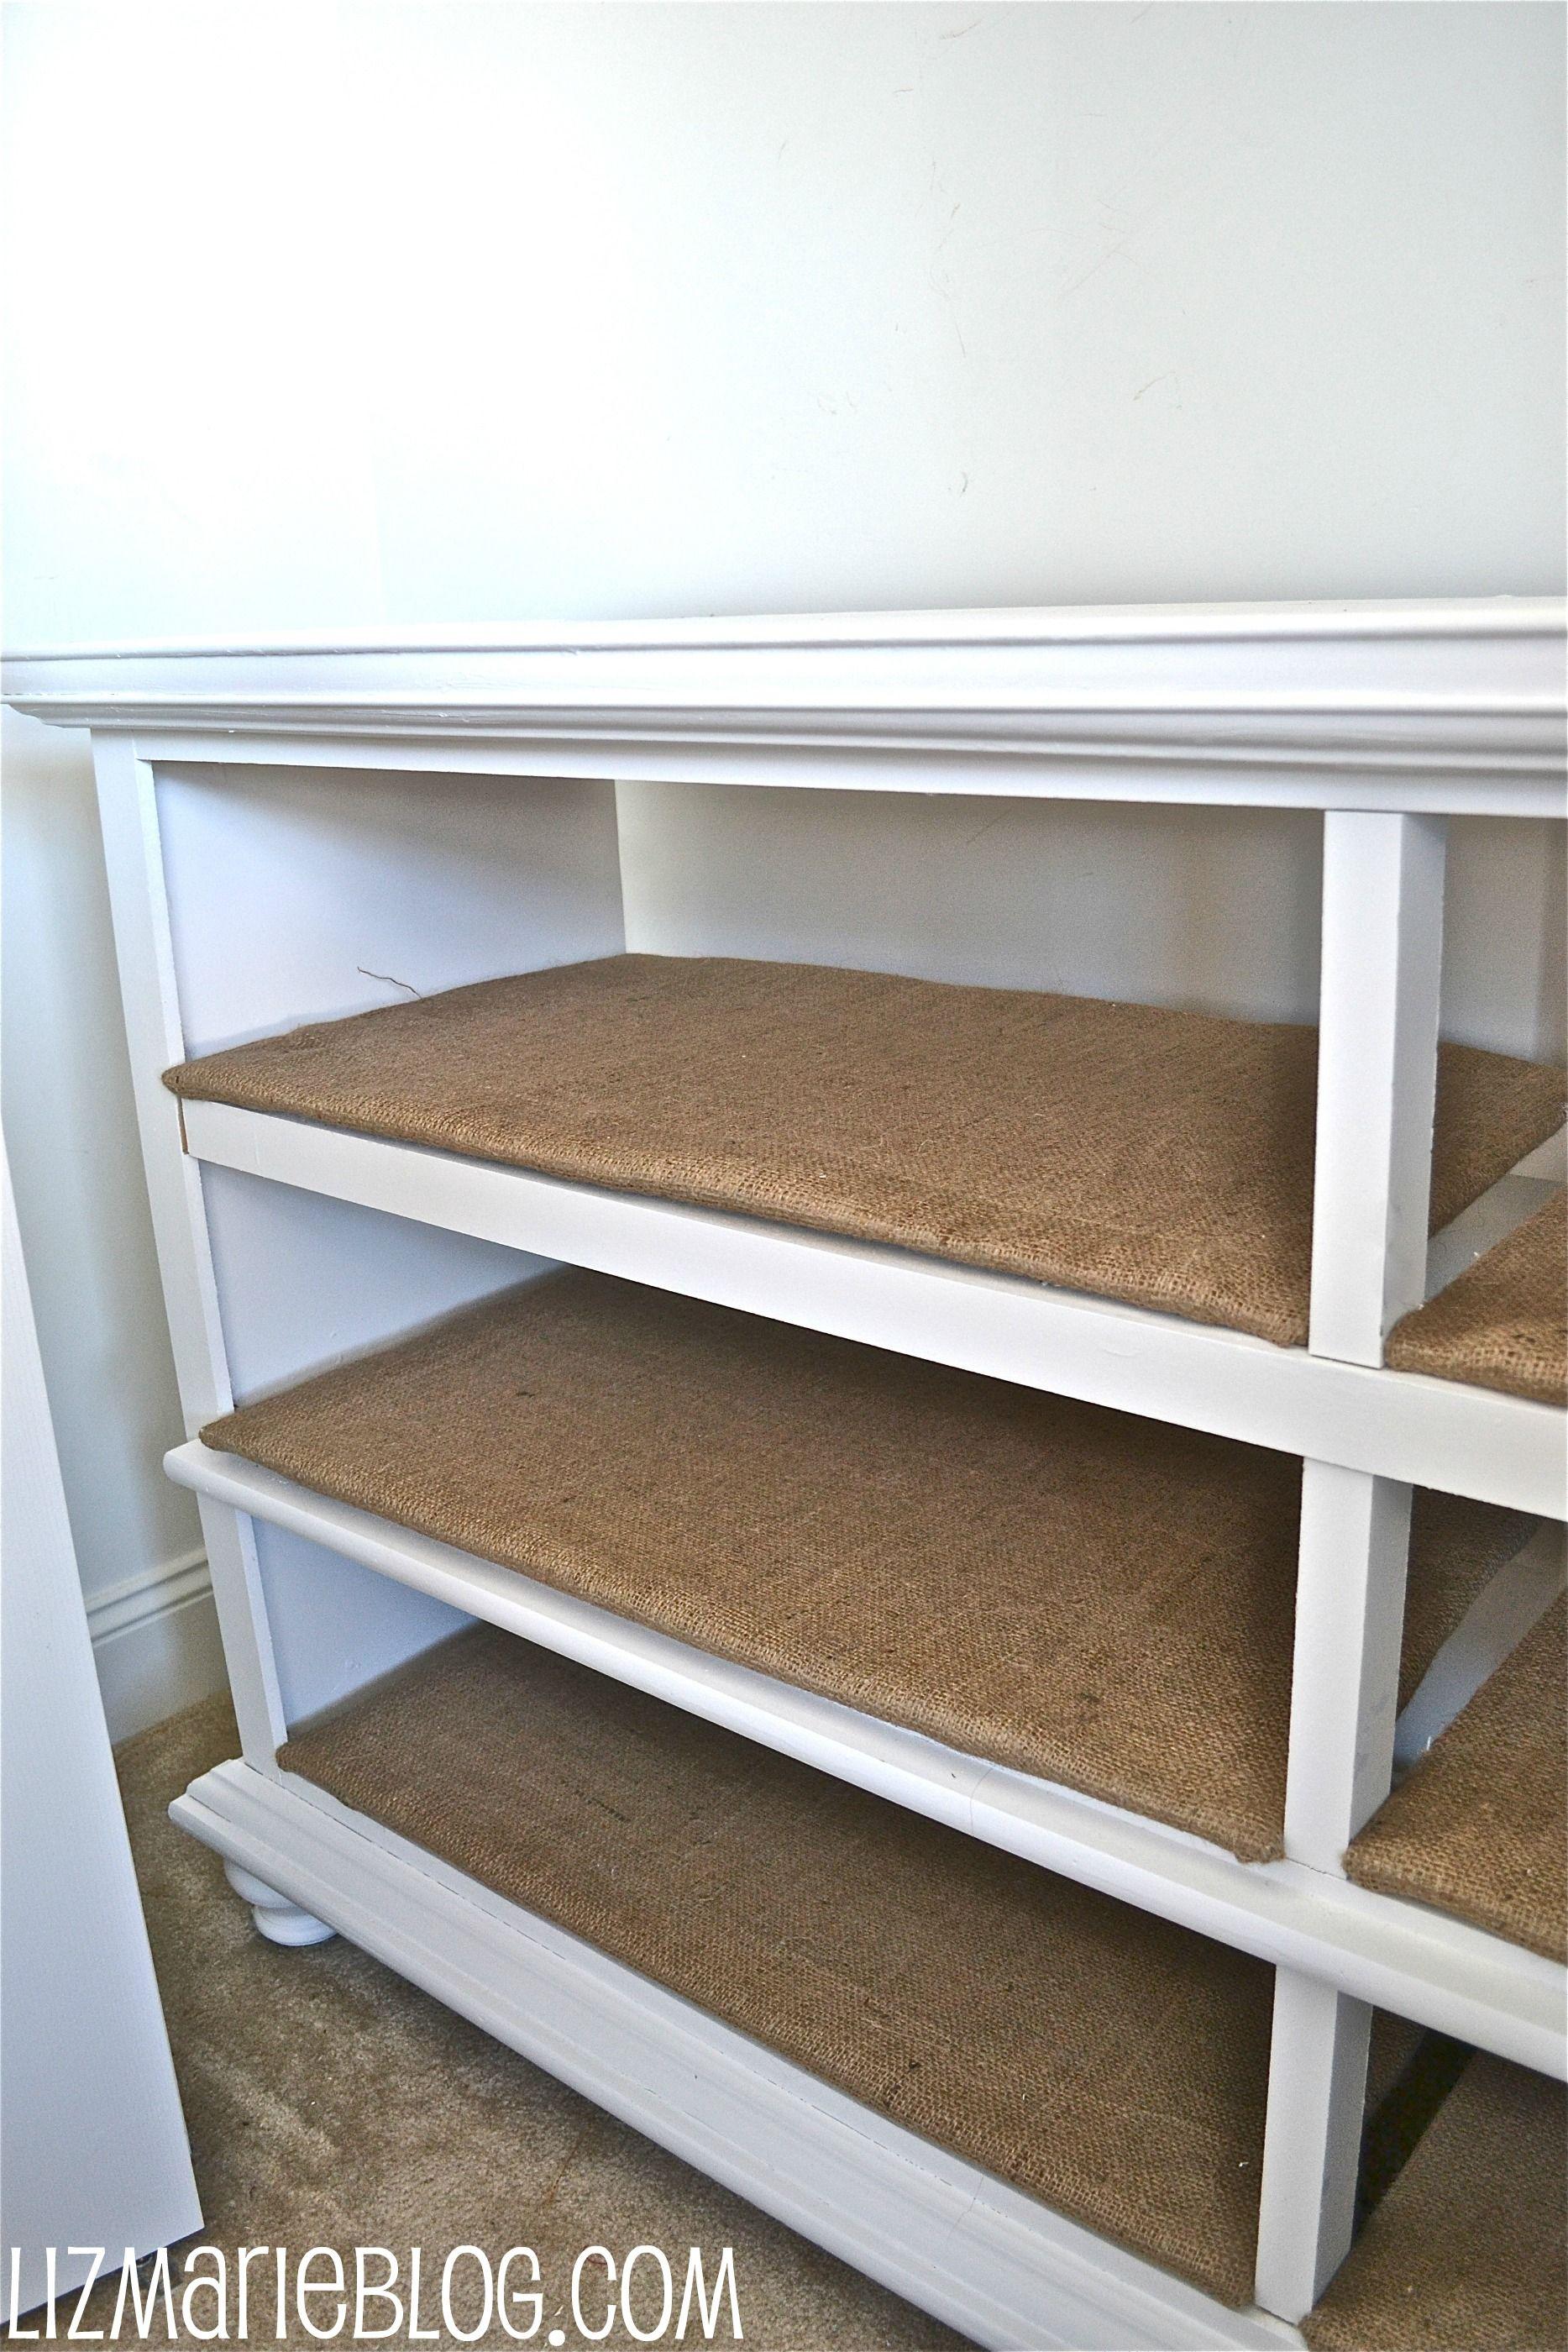 Dresser To Shelves Dresser Shelves Broken Dresser Home Diy